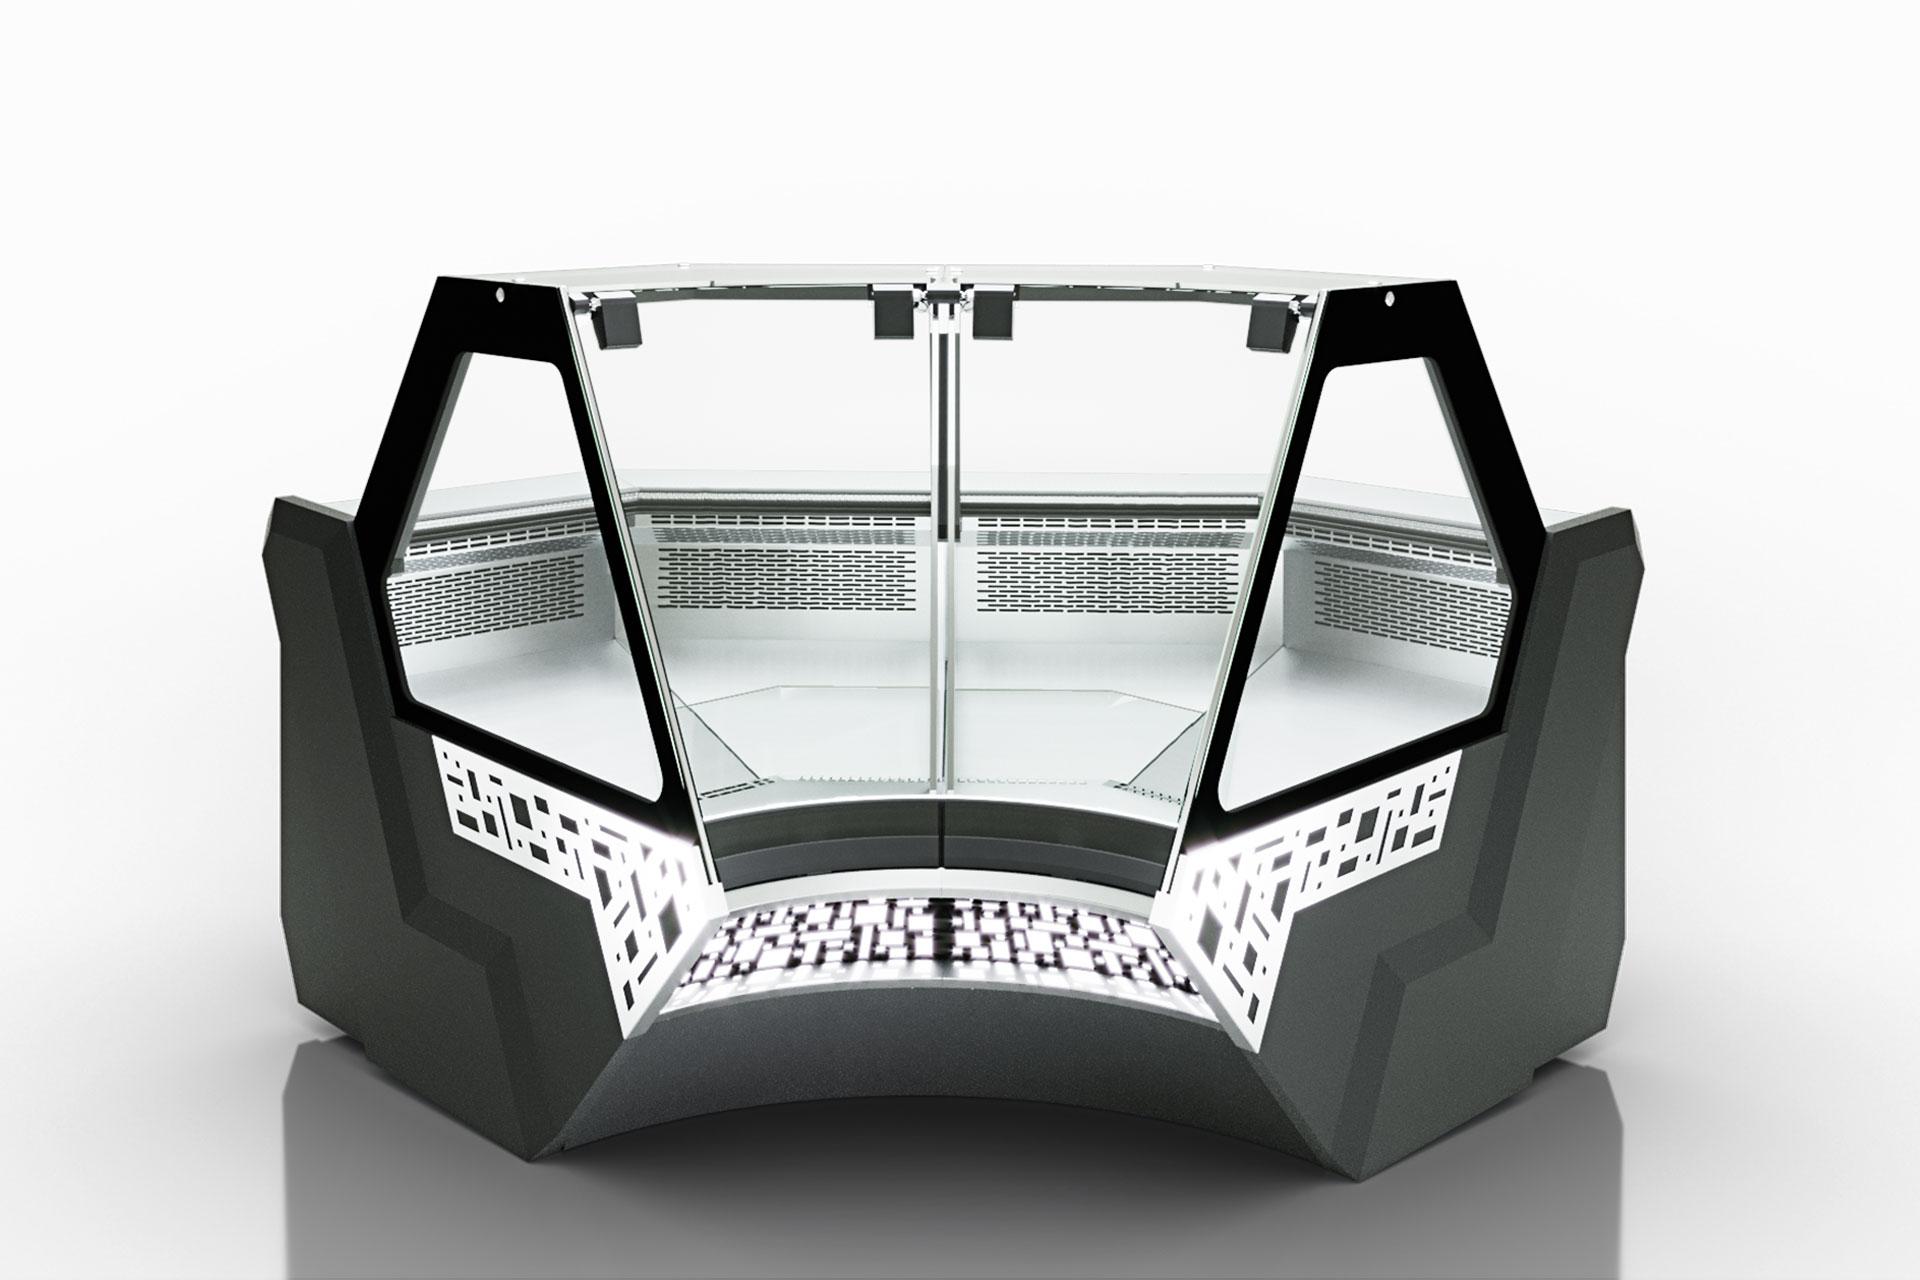 מקרר ויטרינה MISSOURI SAPPHIRE MK 115 DELI PS/OS/SELF M – ANGULAR ELEMENTS